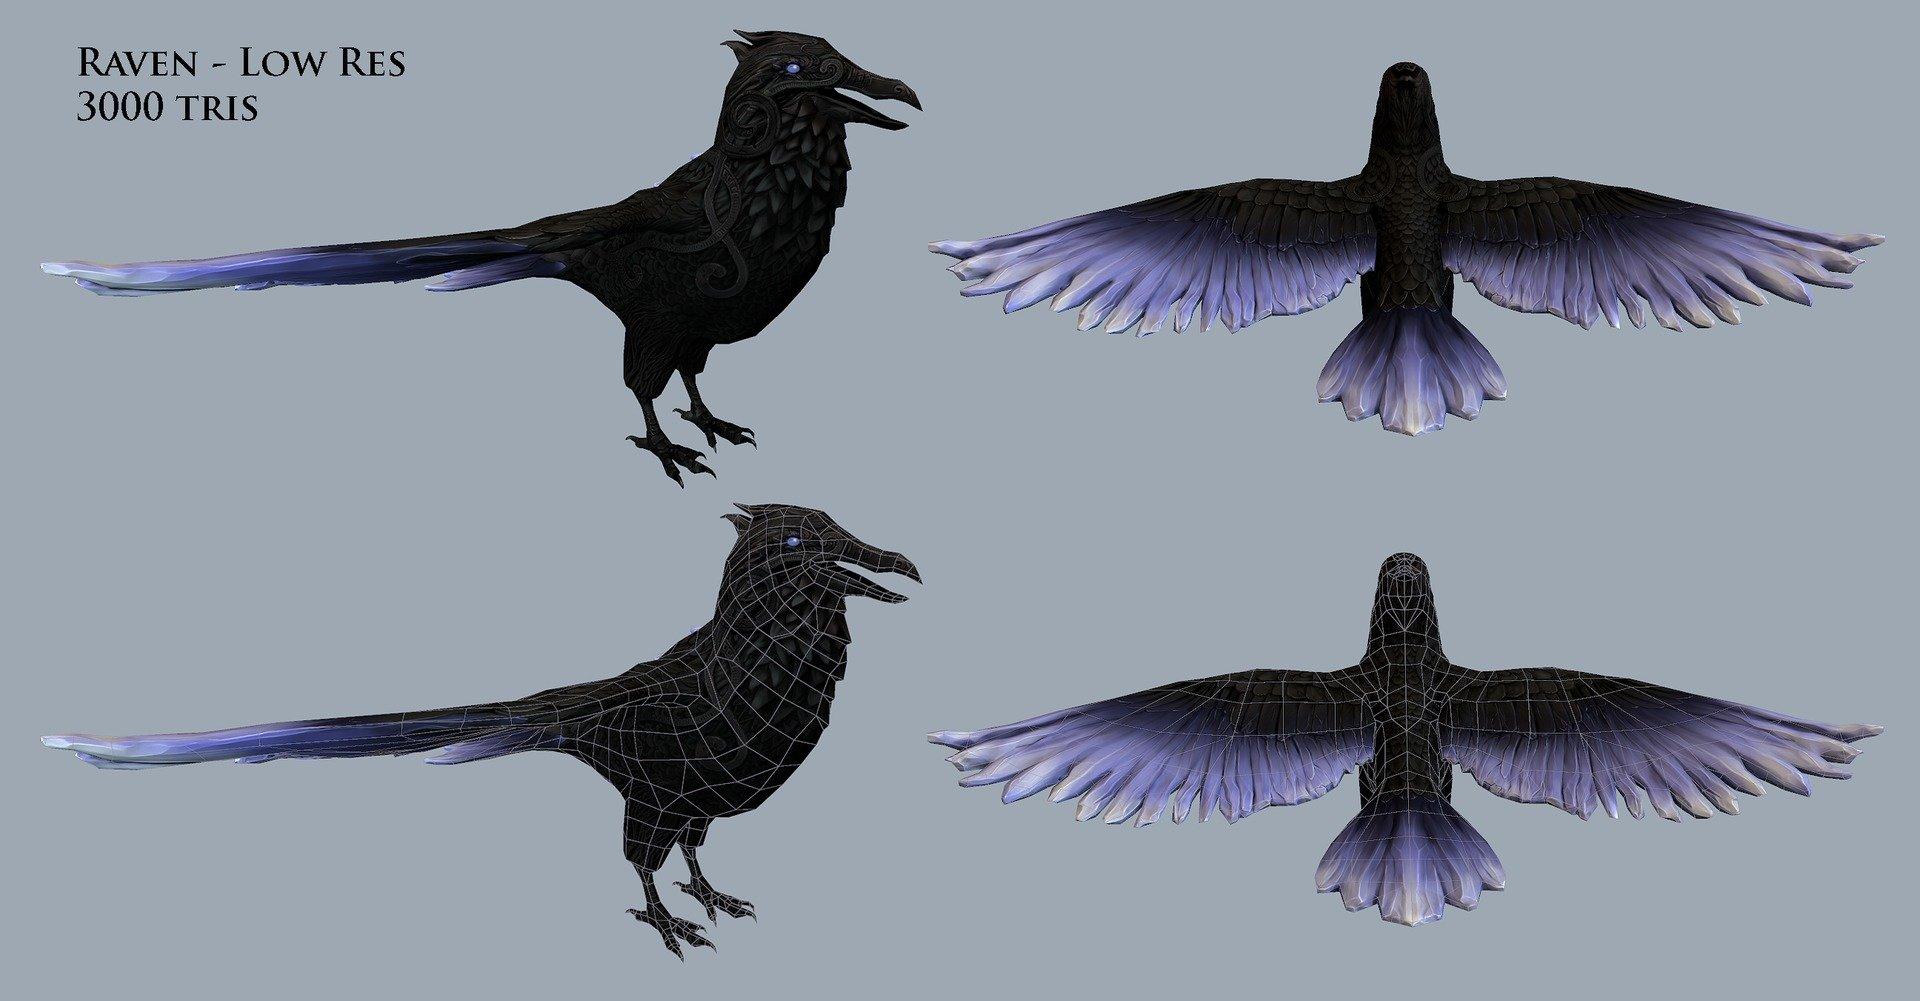 Liz edwards elizabeth edwards raven low